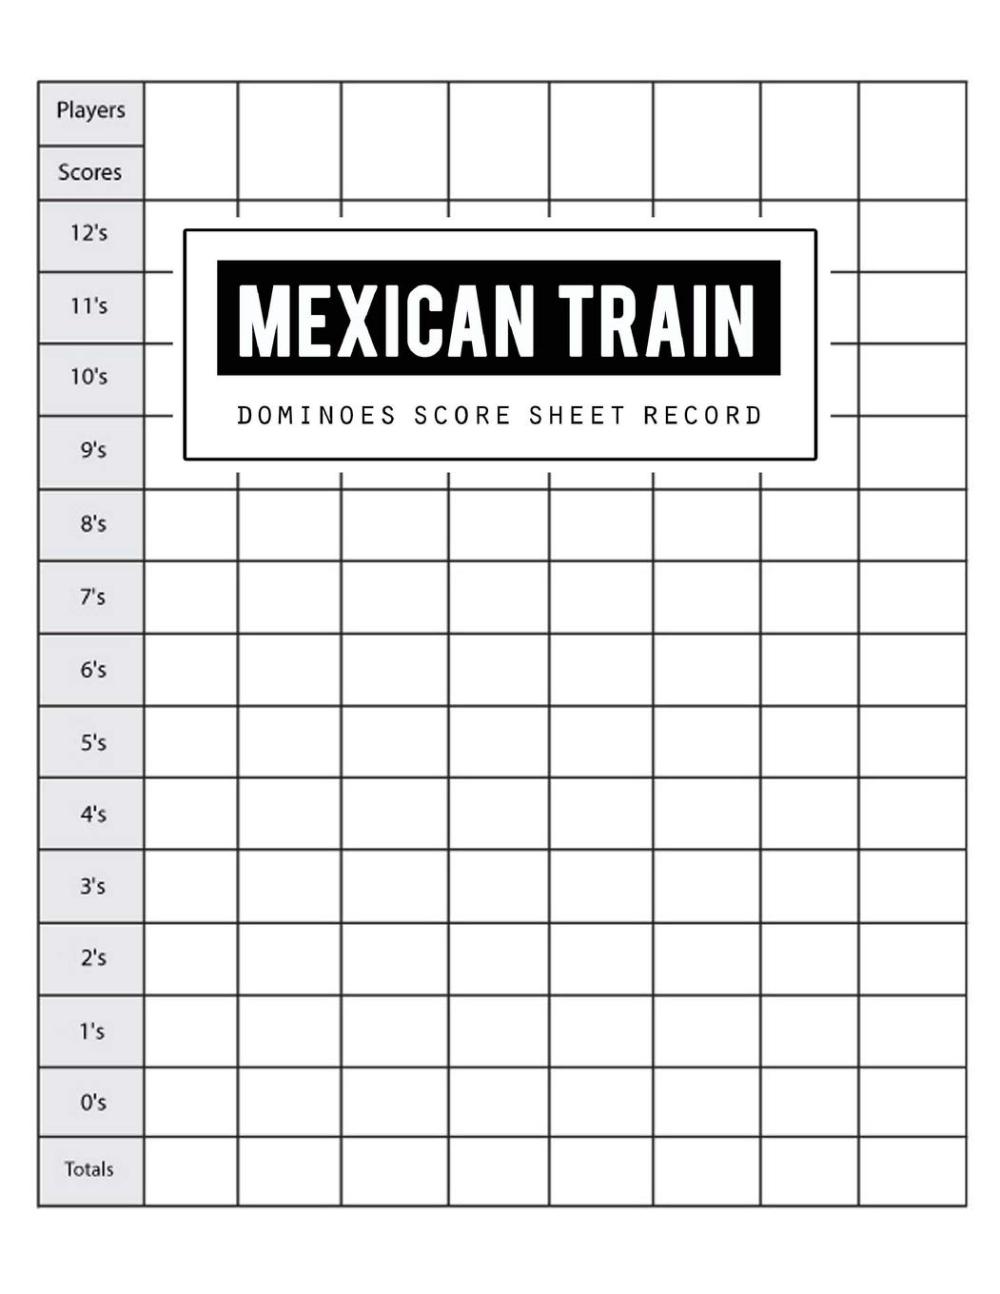 Mexican Train Score Record Dominoes Mexican Train Scoring